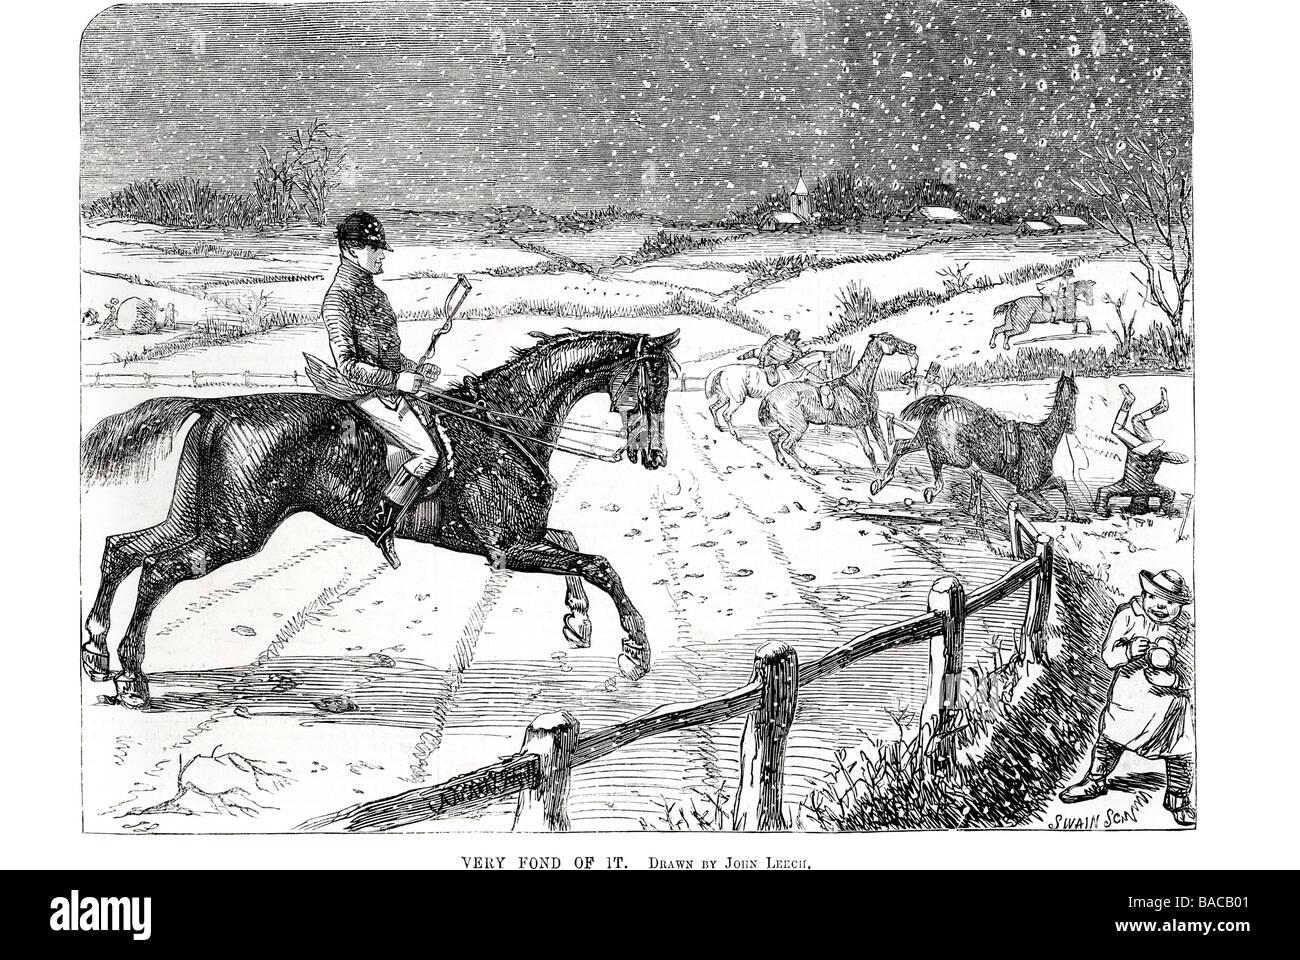 very fond of it drawn by john leech 1854 - Stock Image